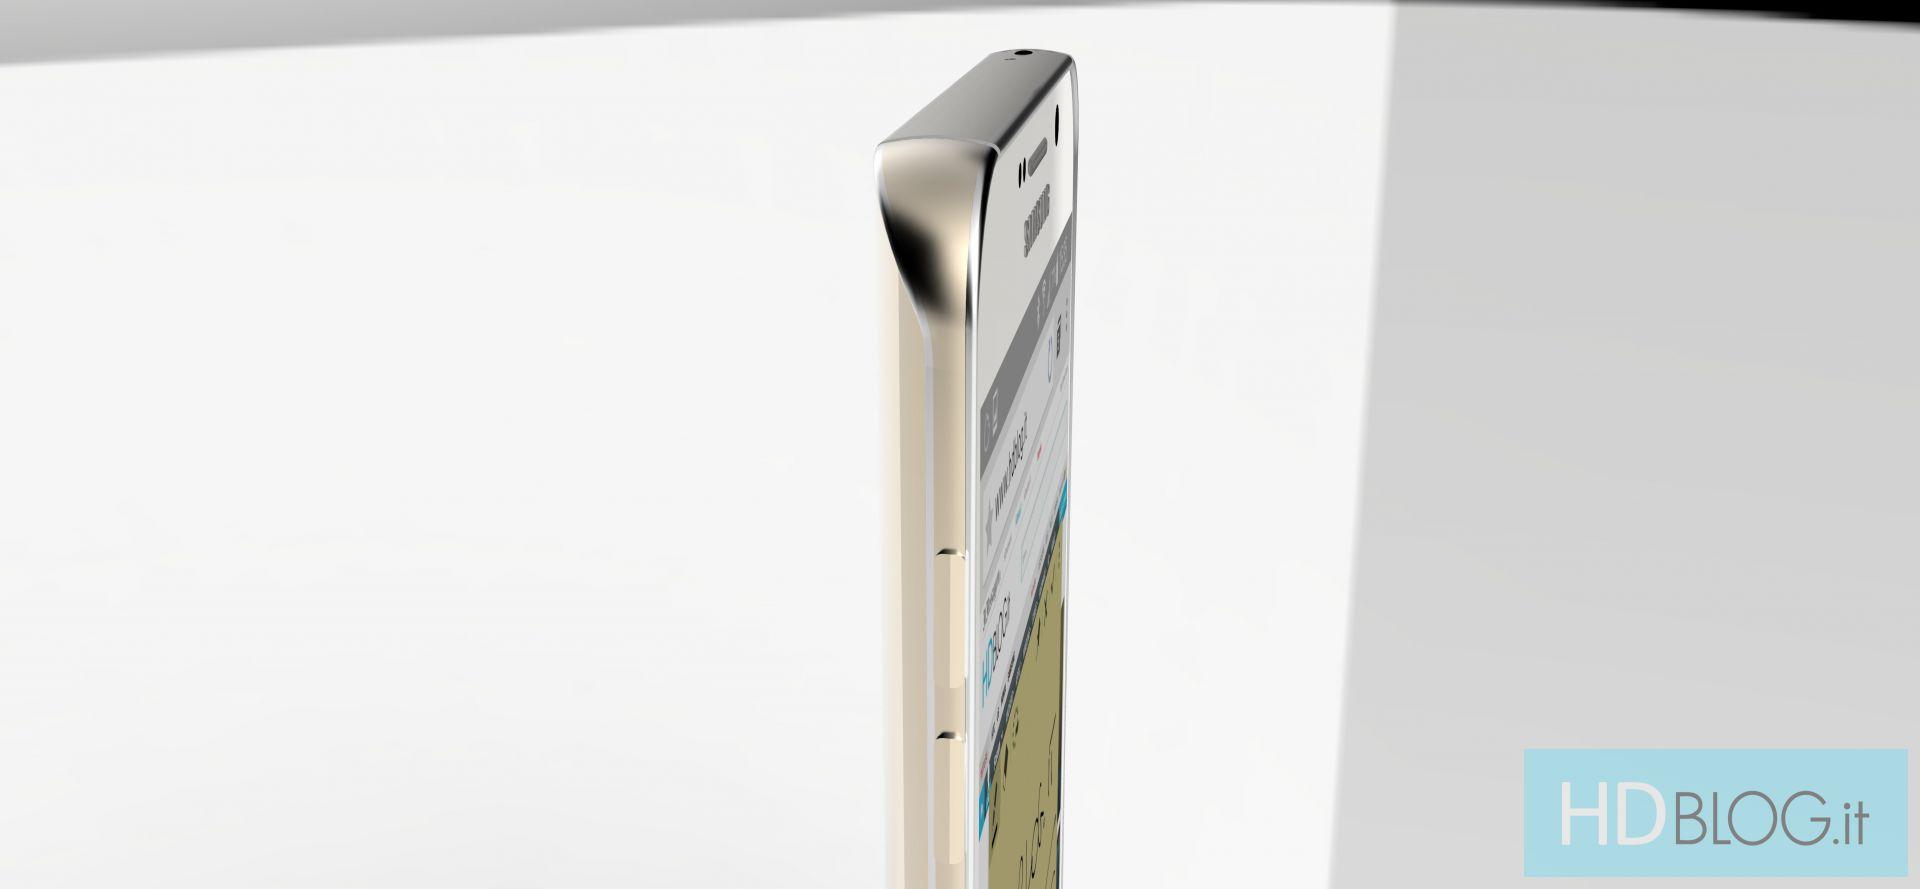 Galaxy-Note-5-schematics-and-concept-renders-23.jpg